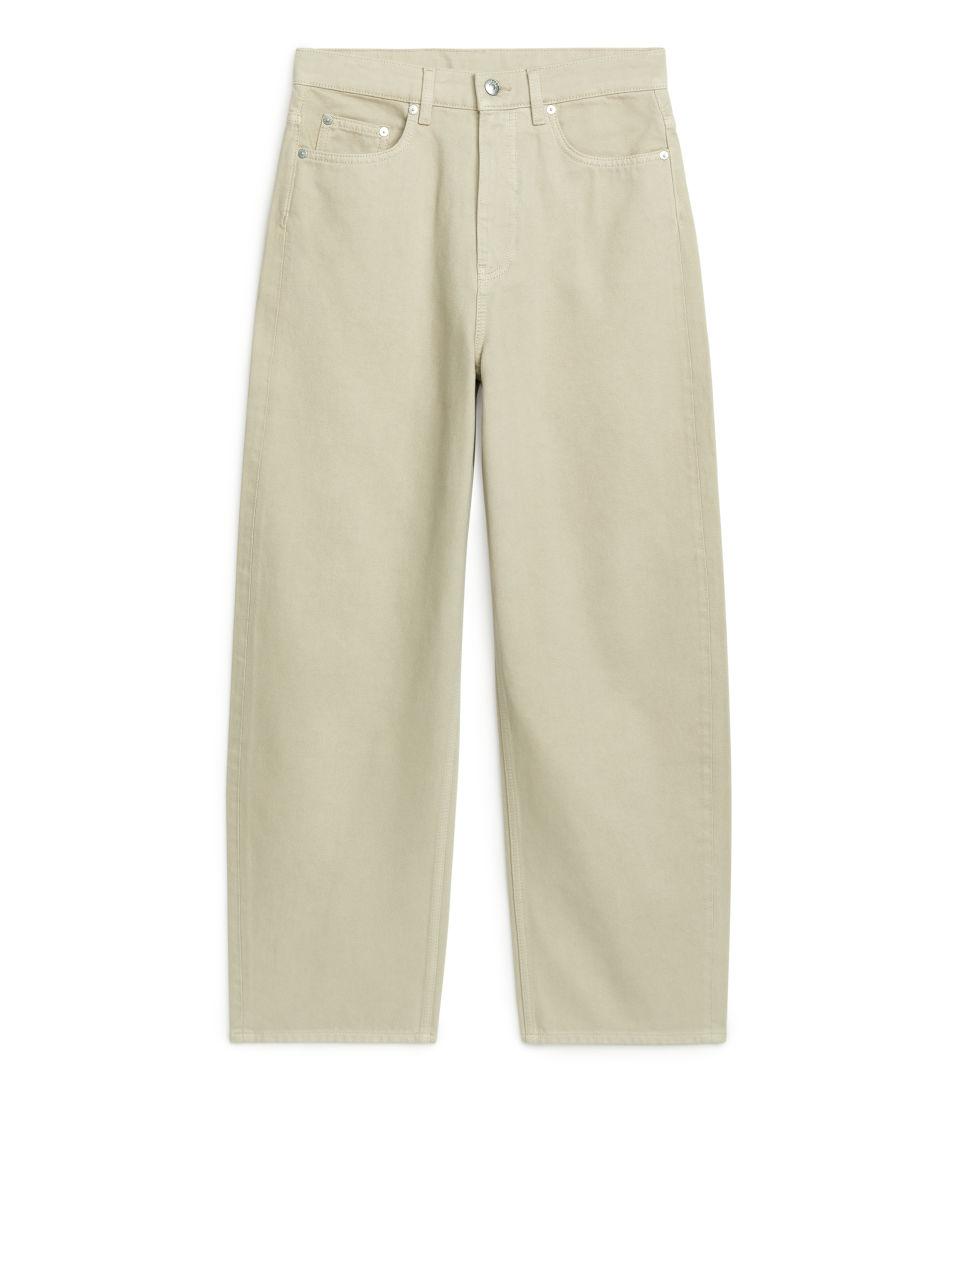 BARREL LEG Jeans - Green